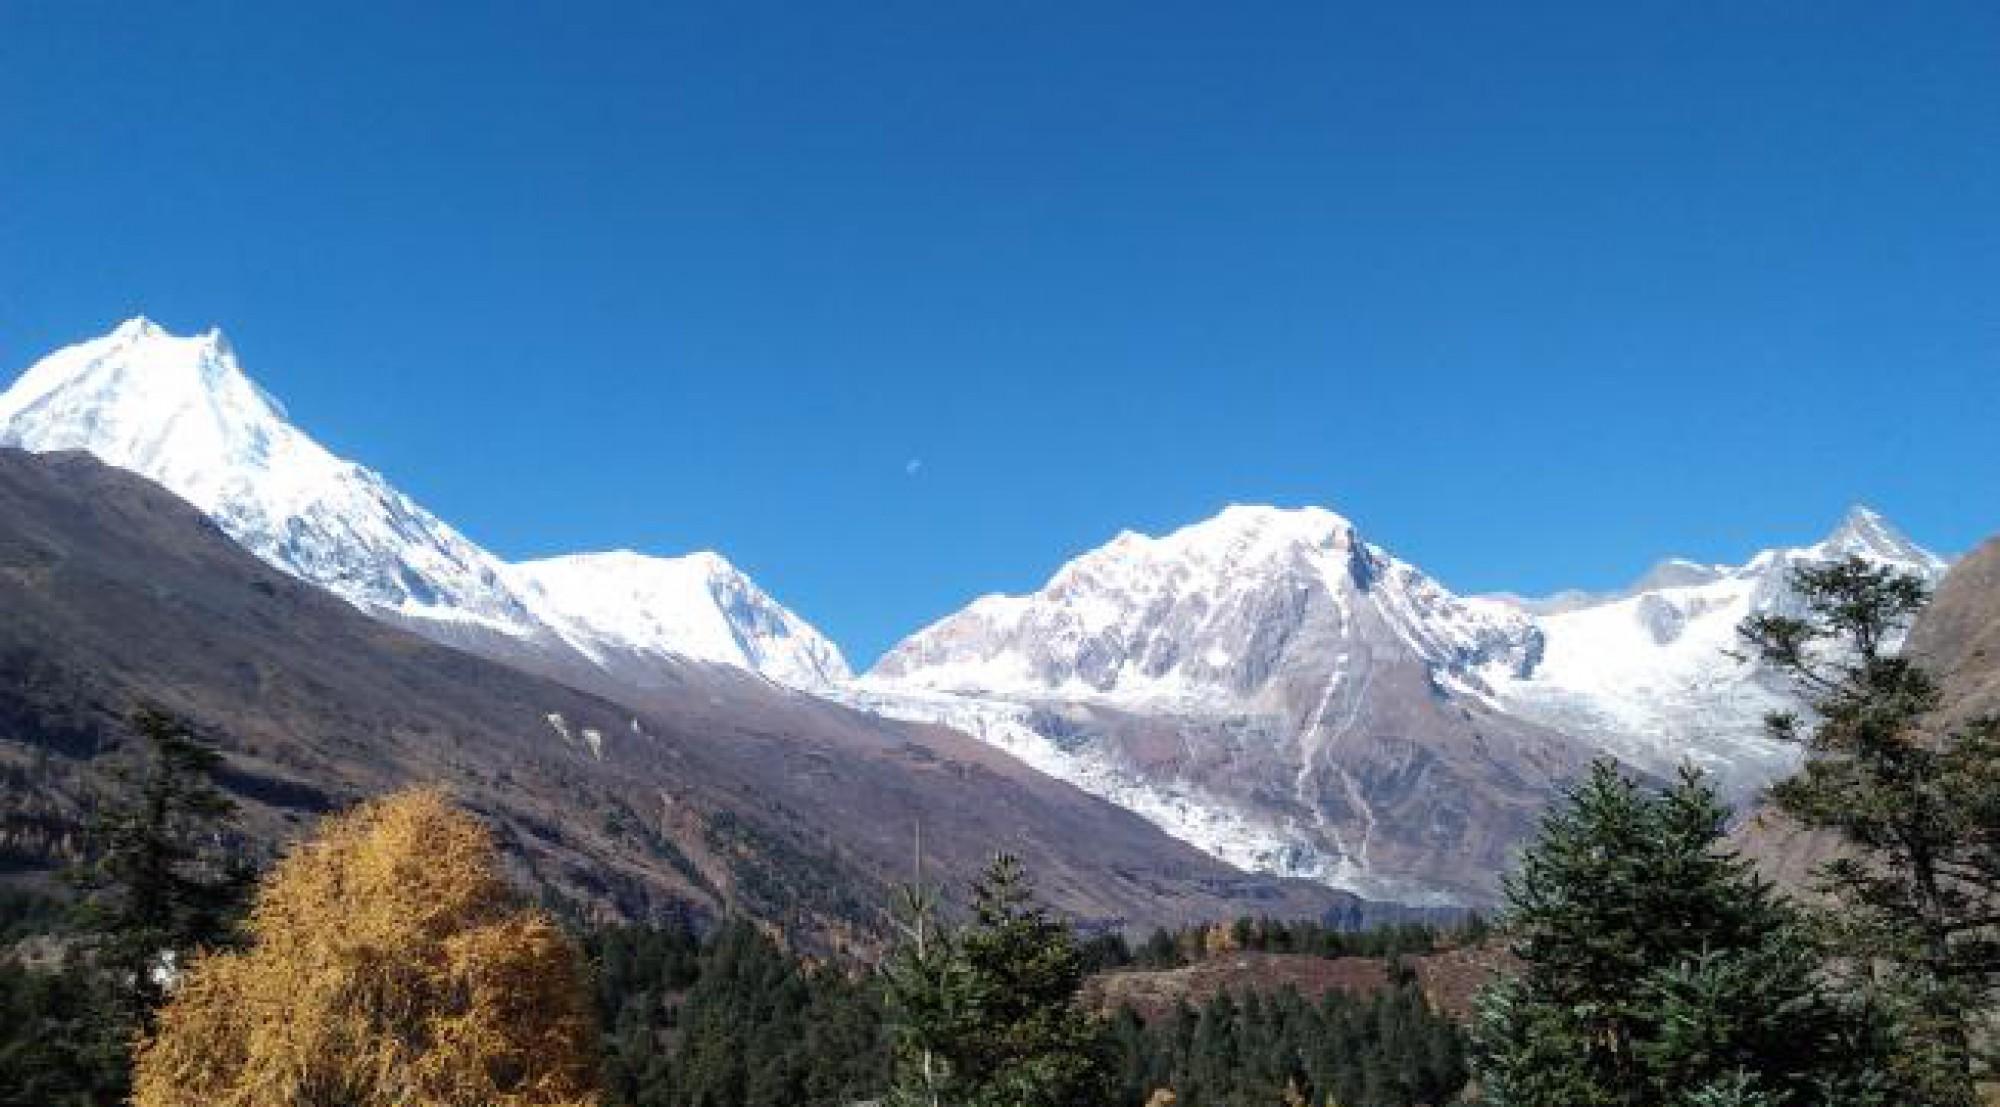 Tsum Valley and Manaslu Trek